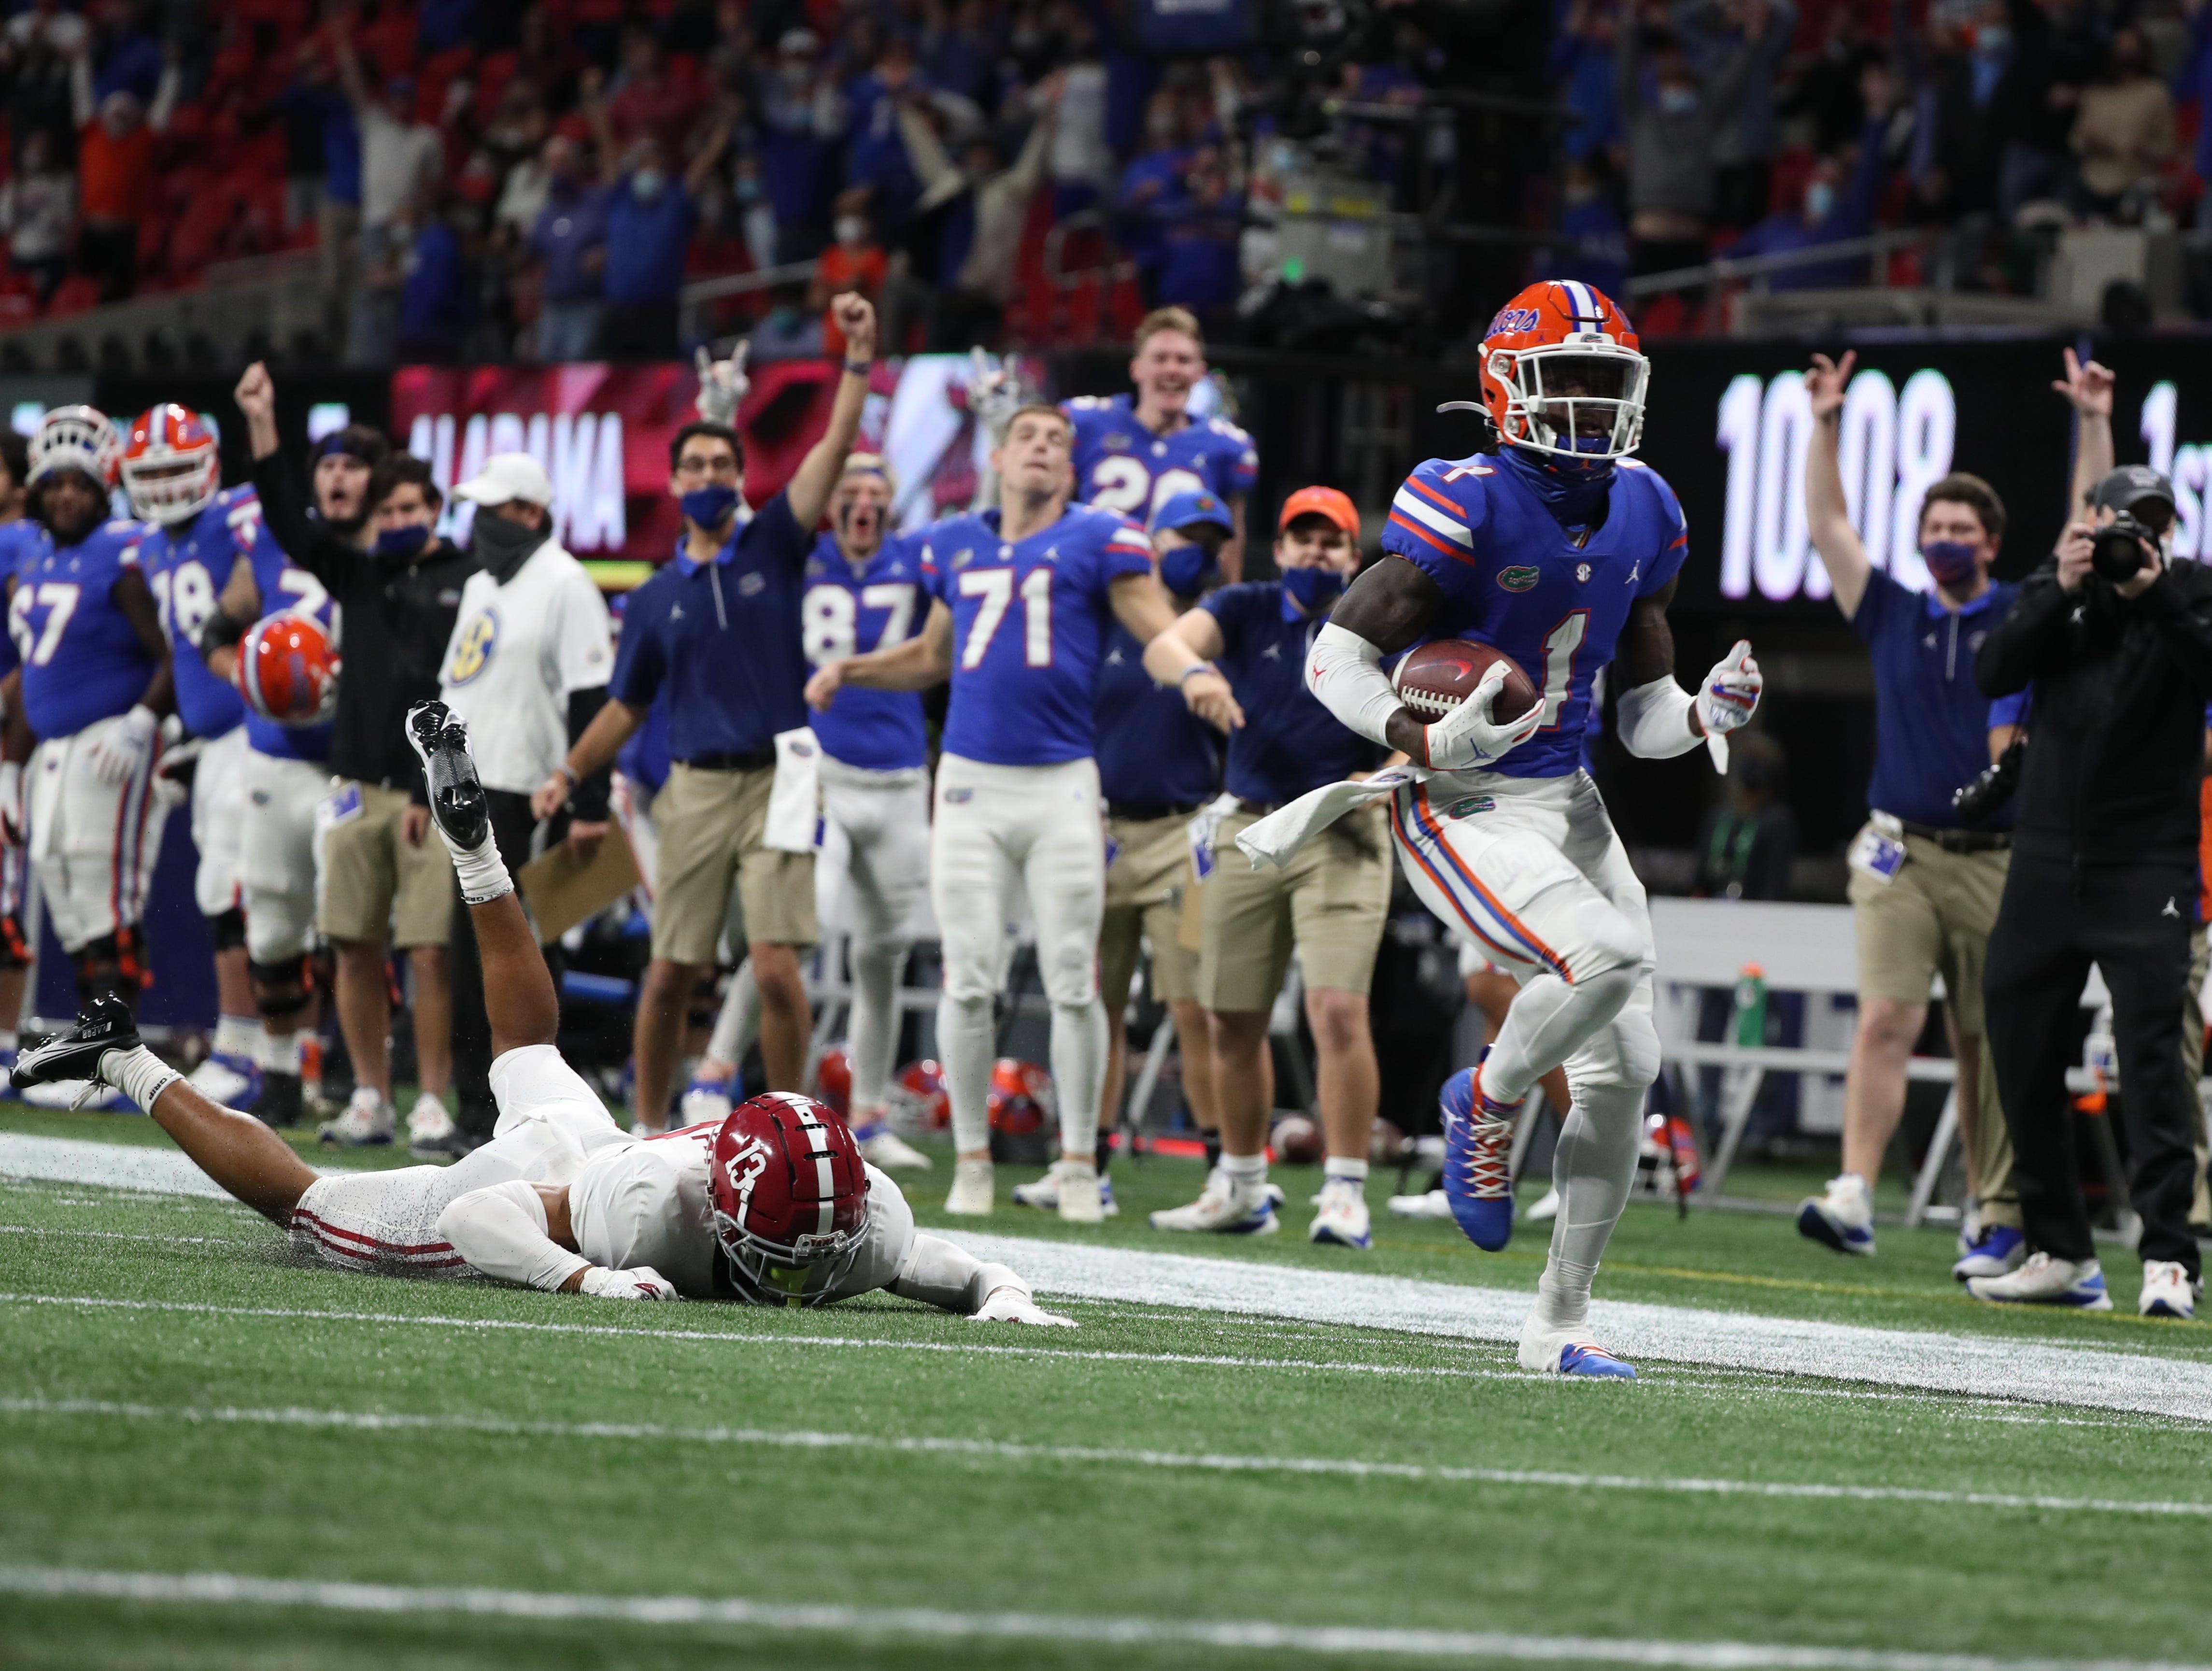 12 yard Florida Gators